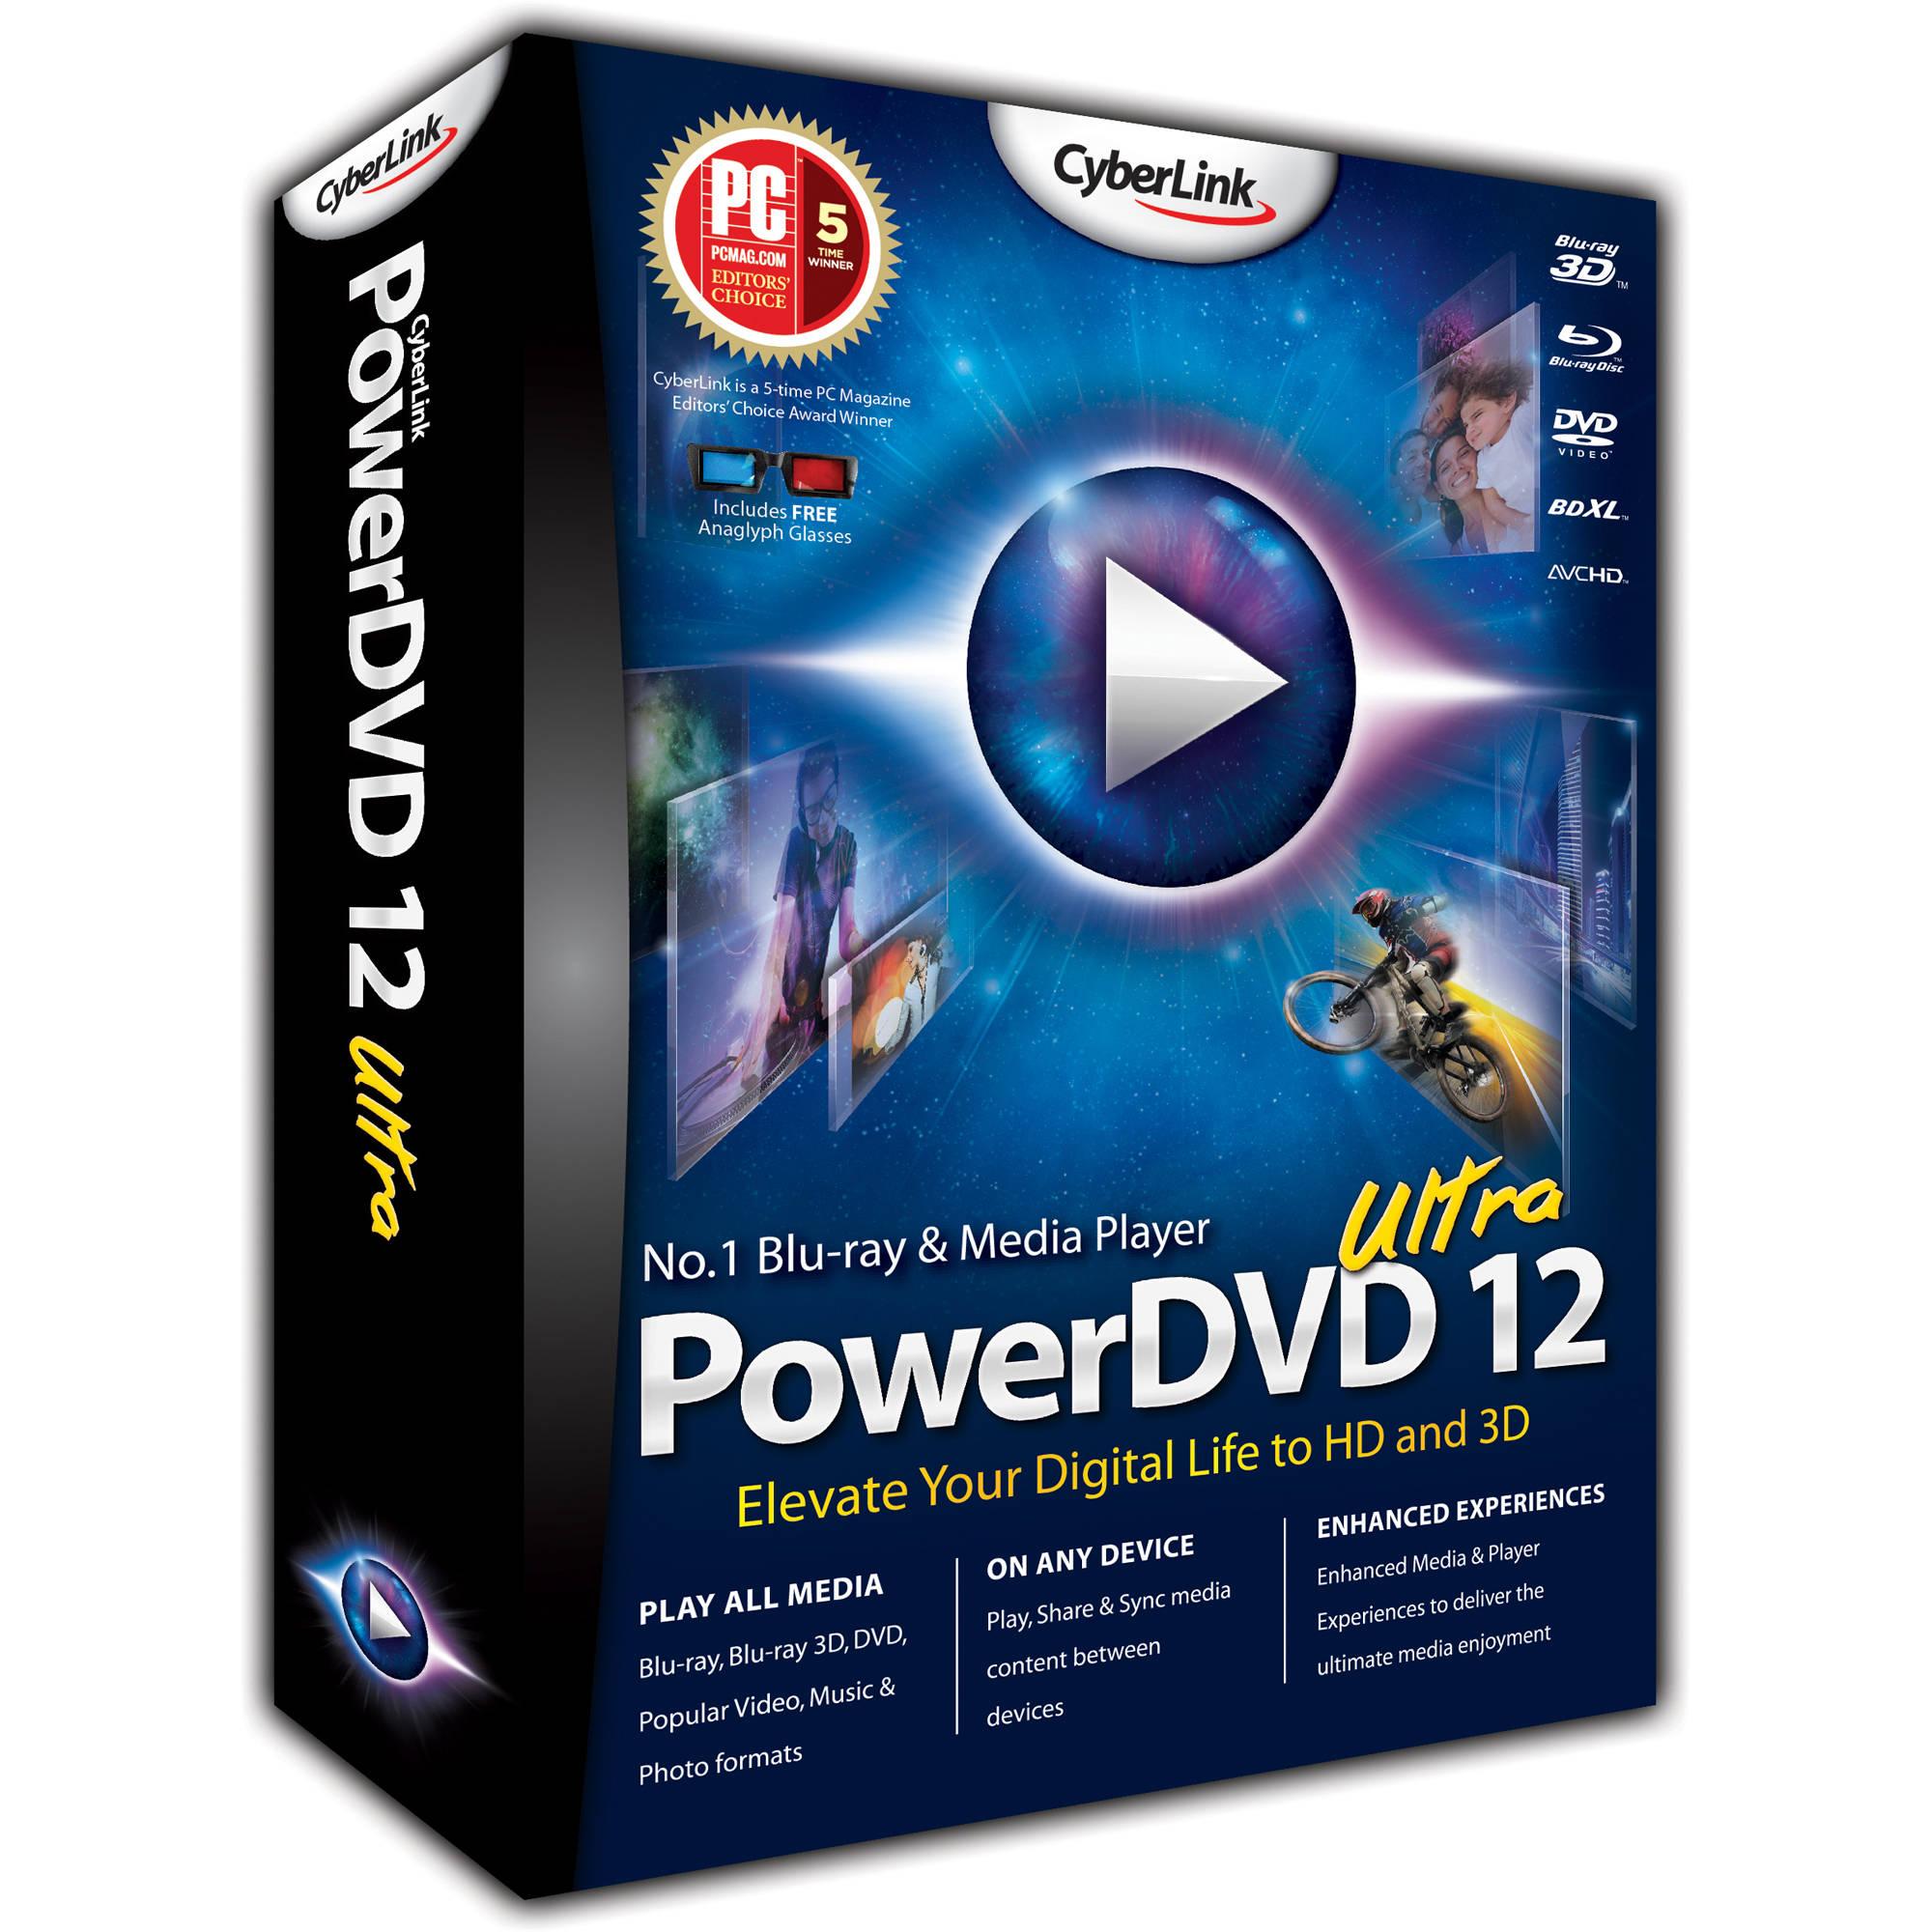 powerdvd 12 破解